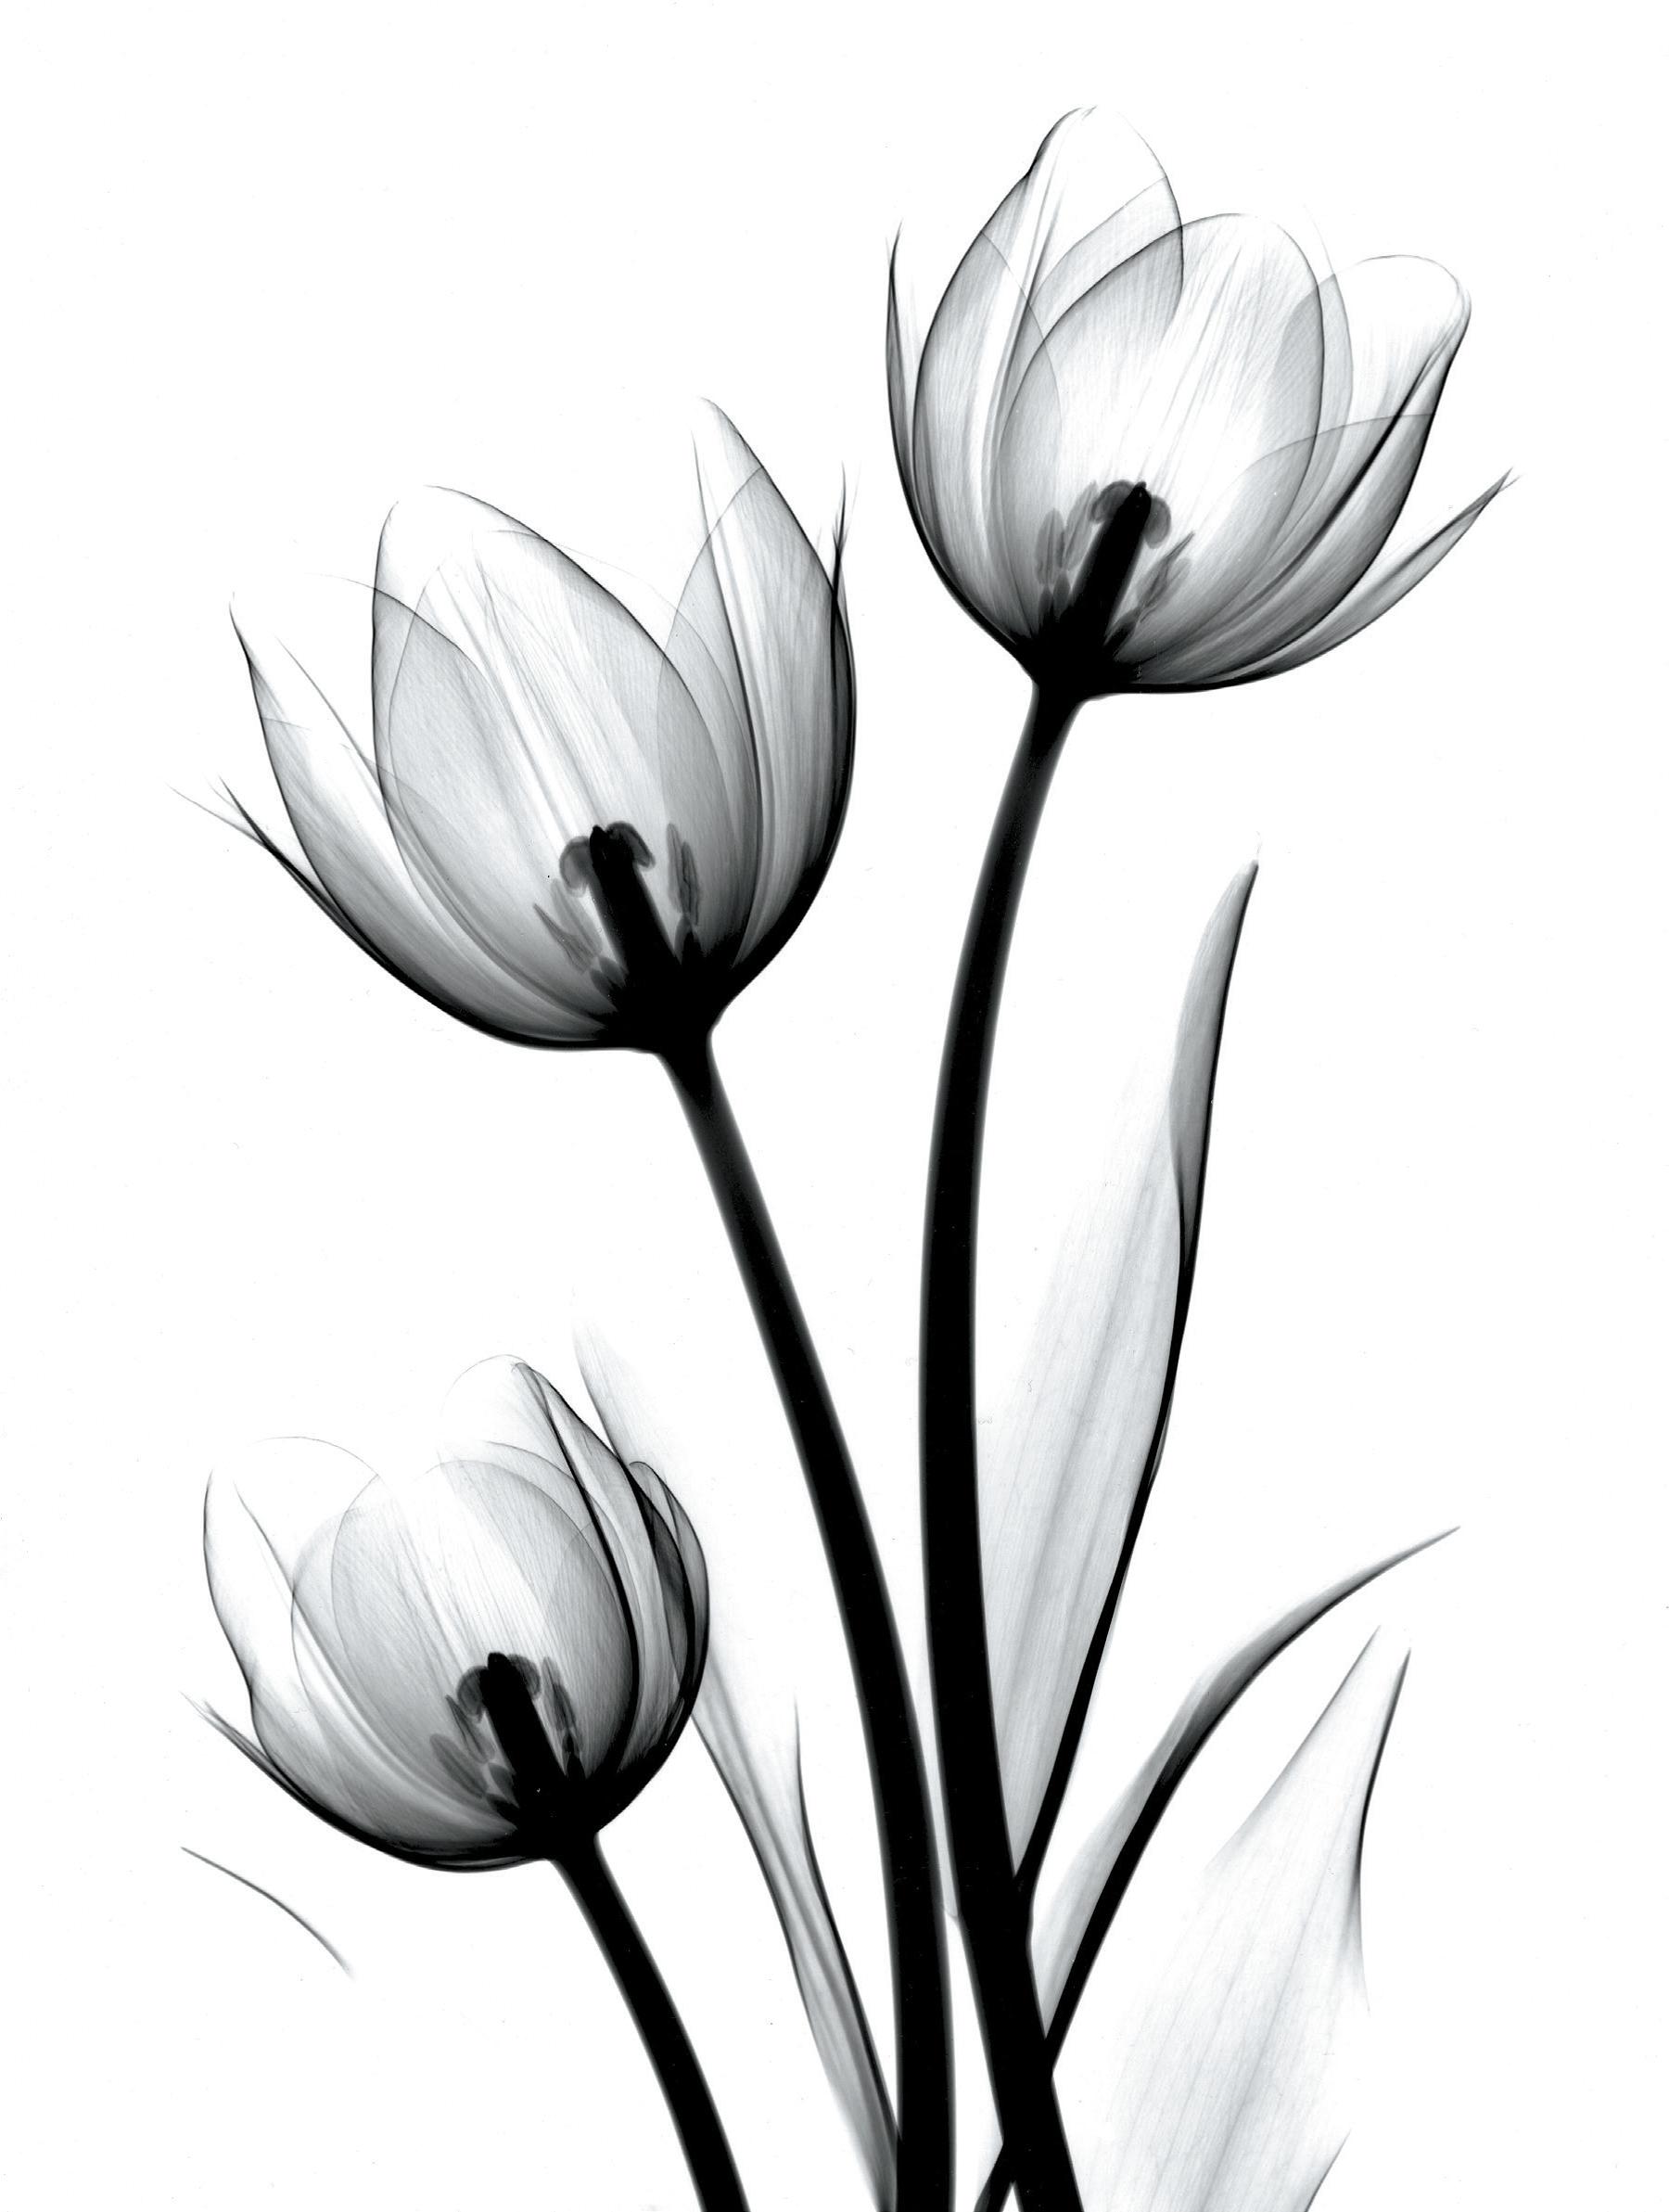 Tulip drawings in pencil free download best tulip drawings in